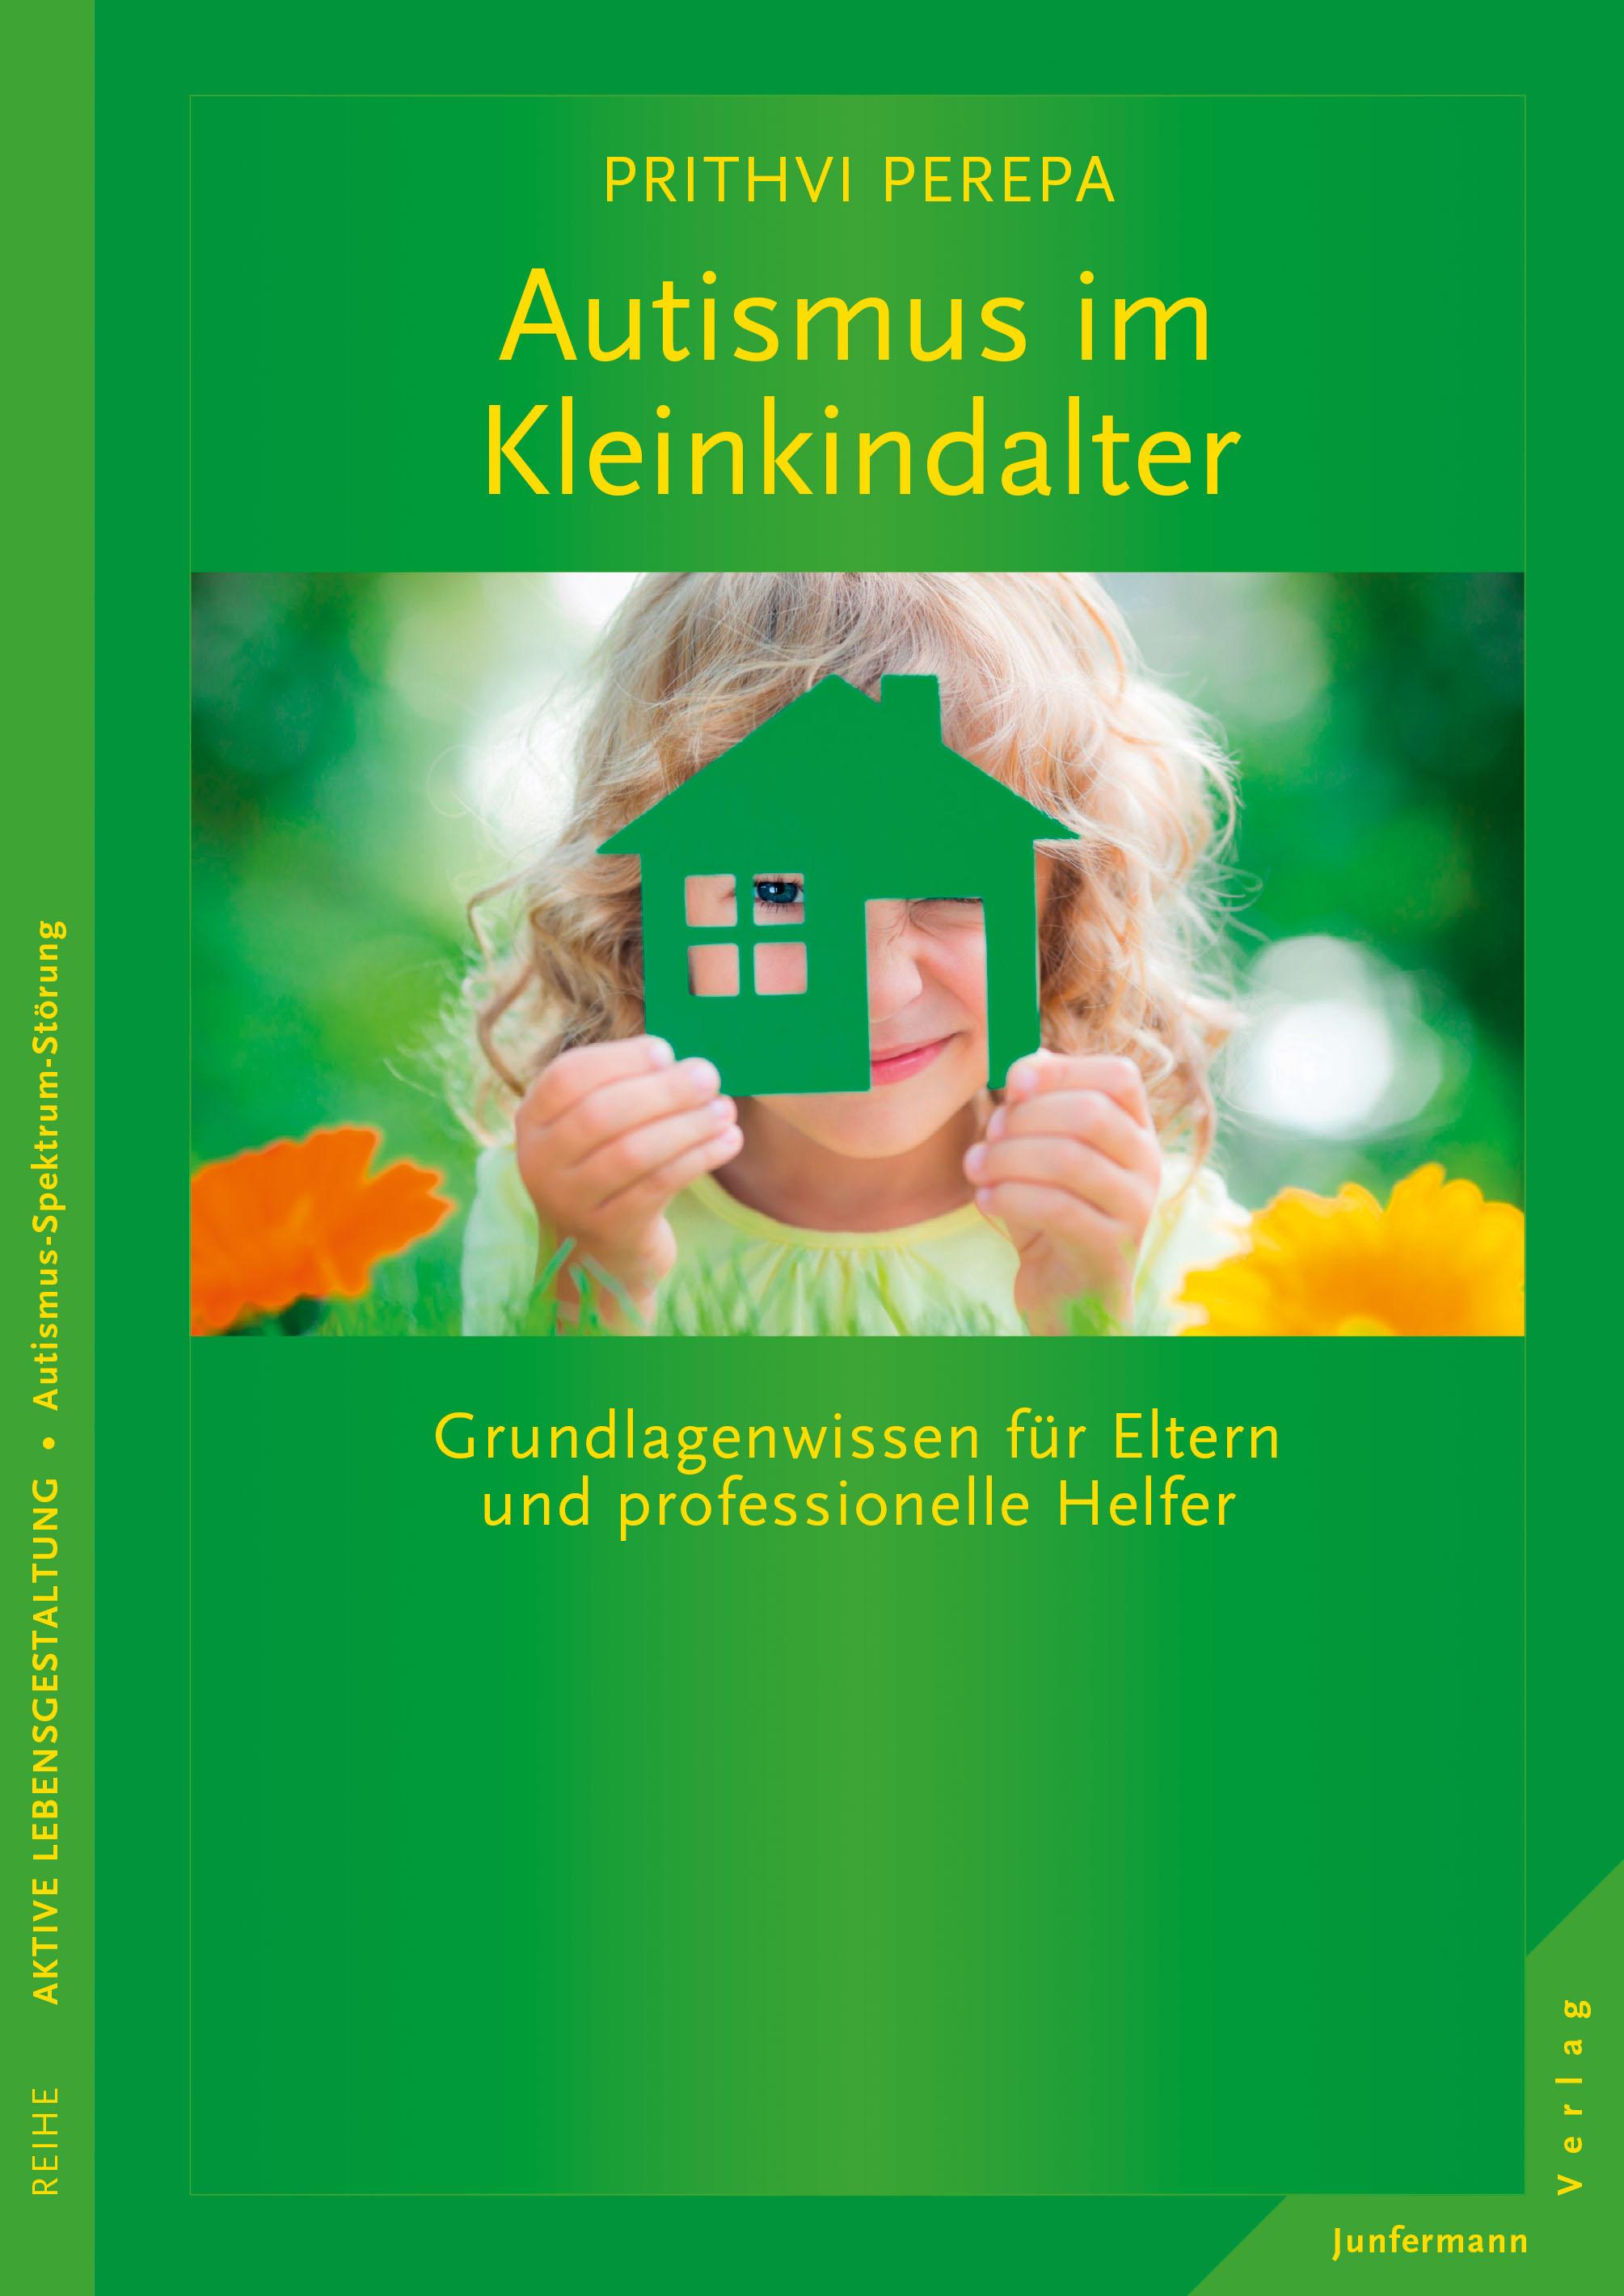 Perepa-AutismusKleinkindalter_VAR1.qxp_Cover-Vorschau